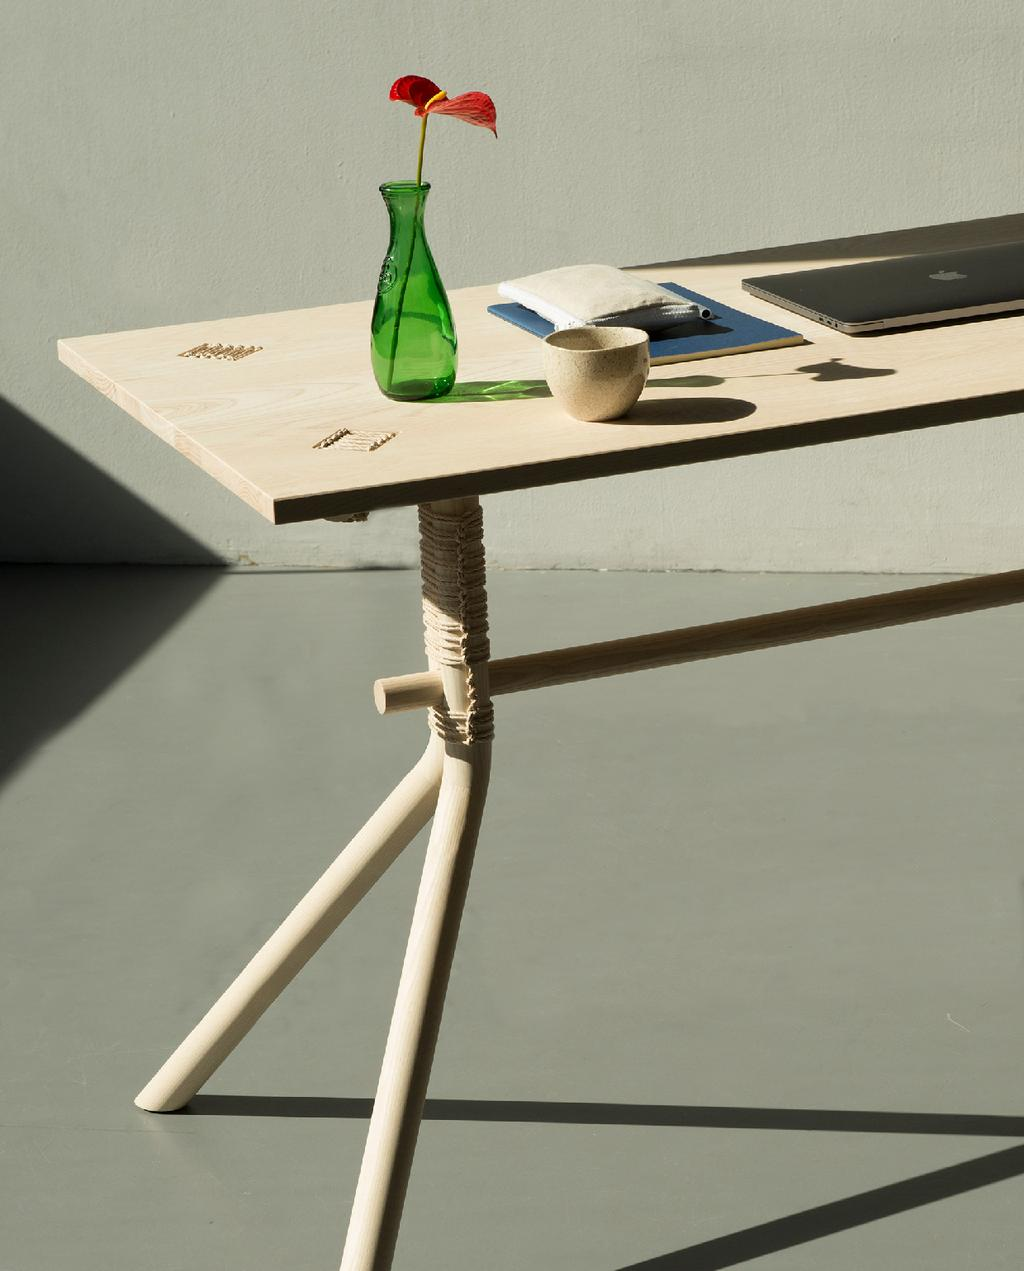 vtwonen blog StudentDesign - design eettafel blank hout